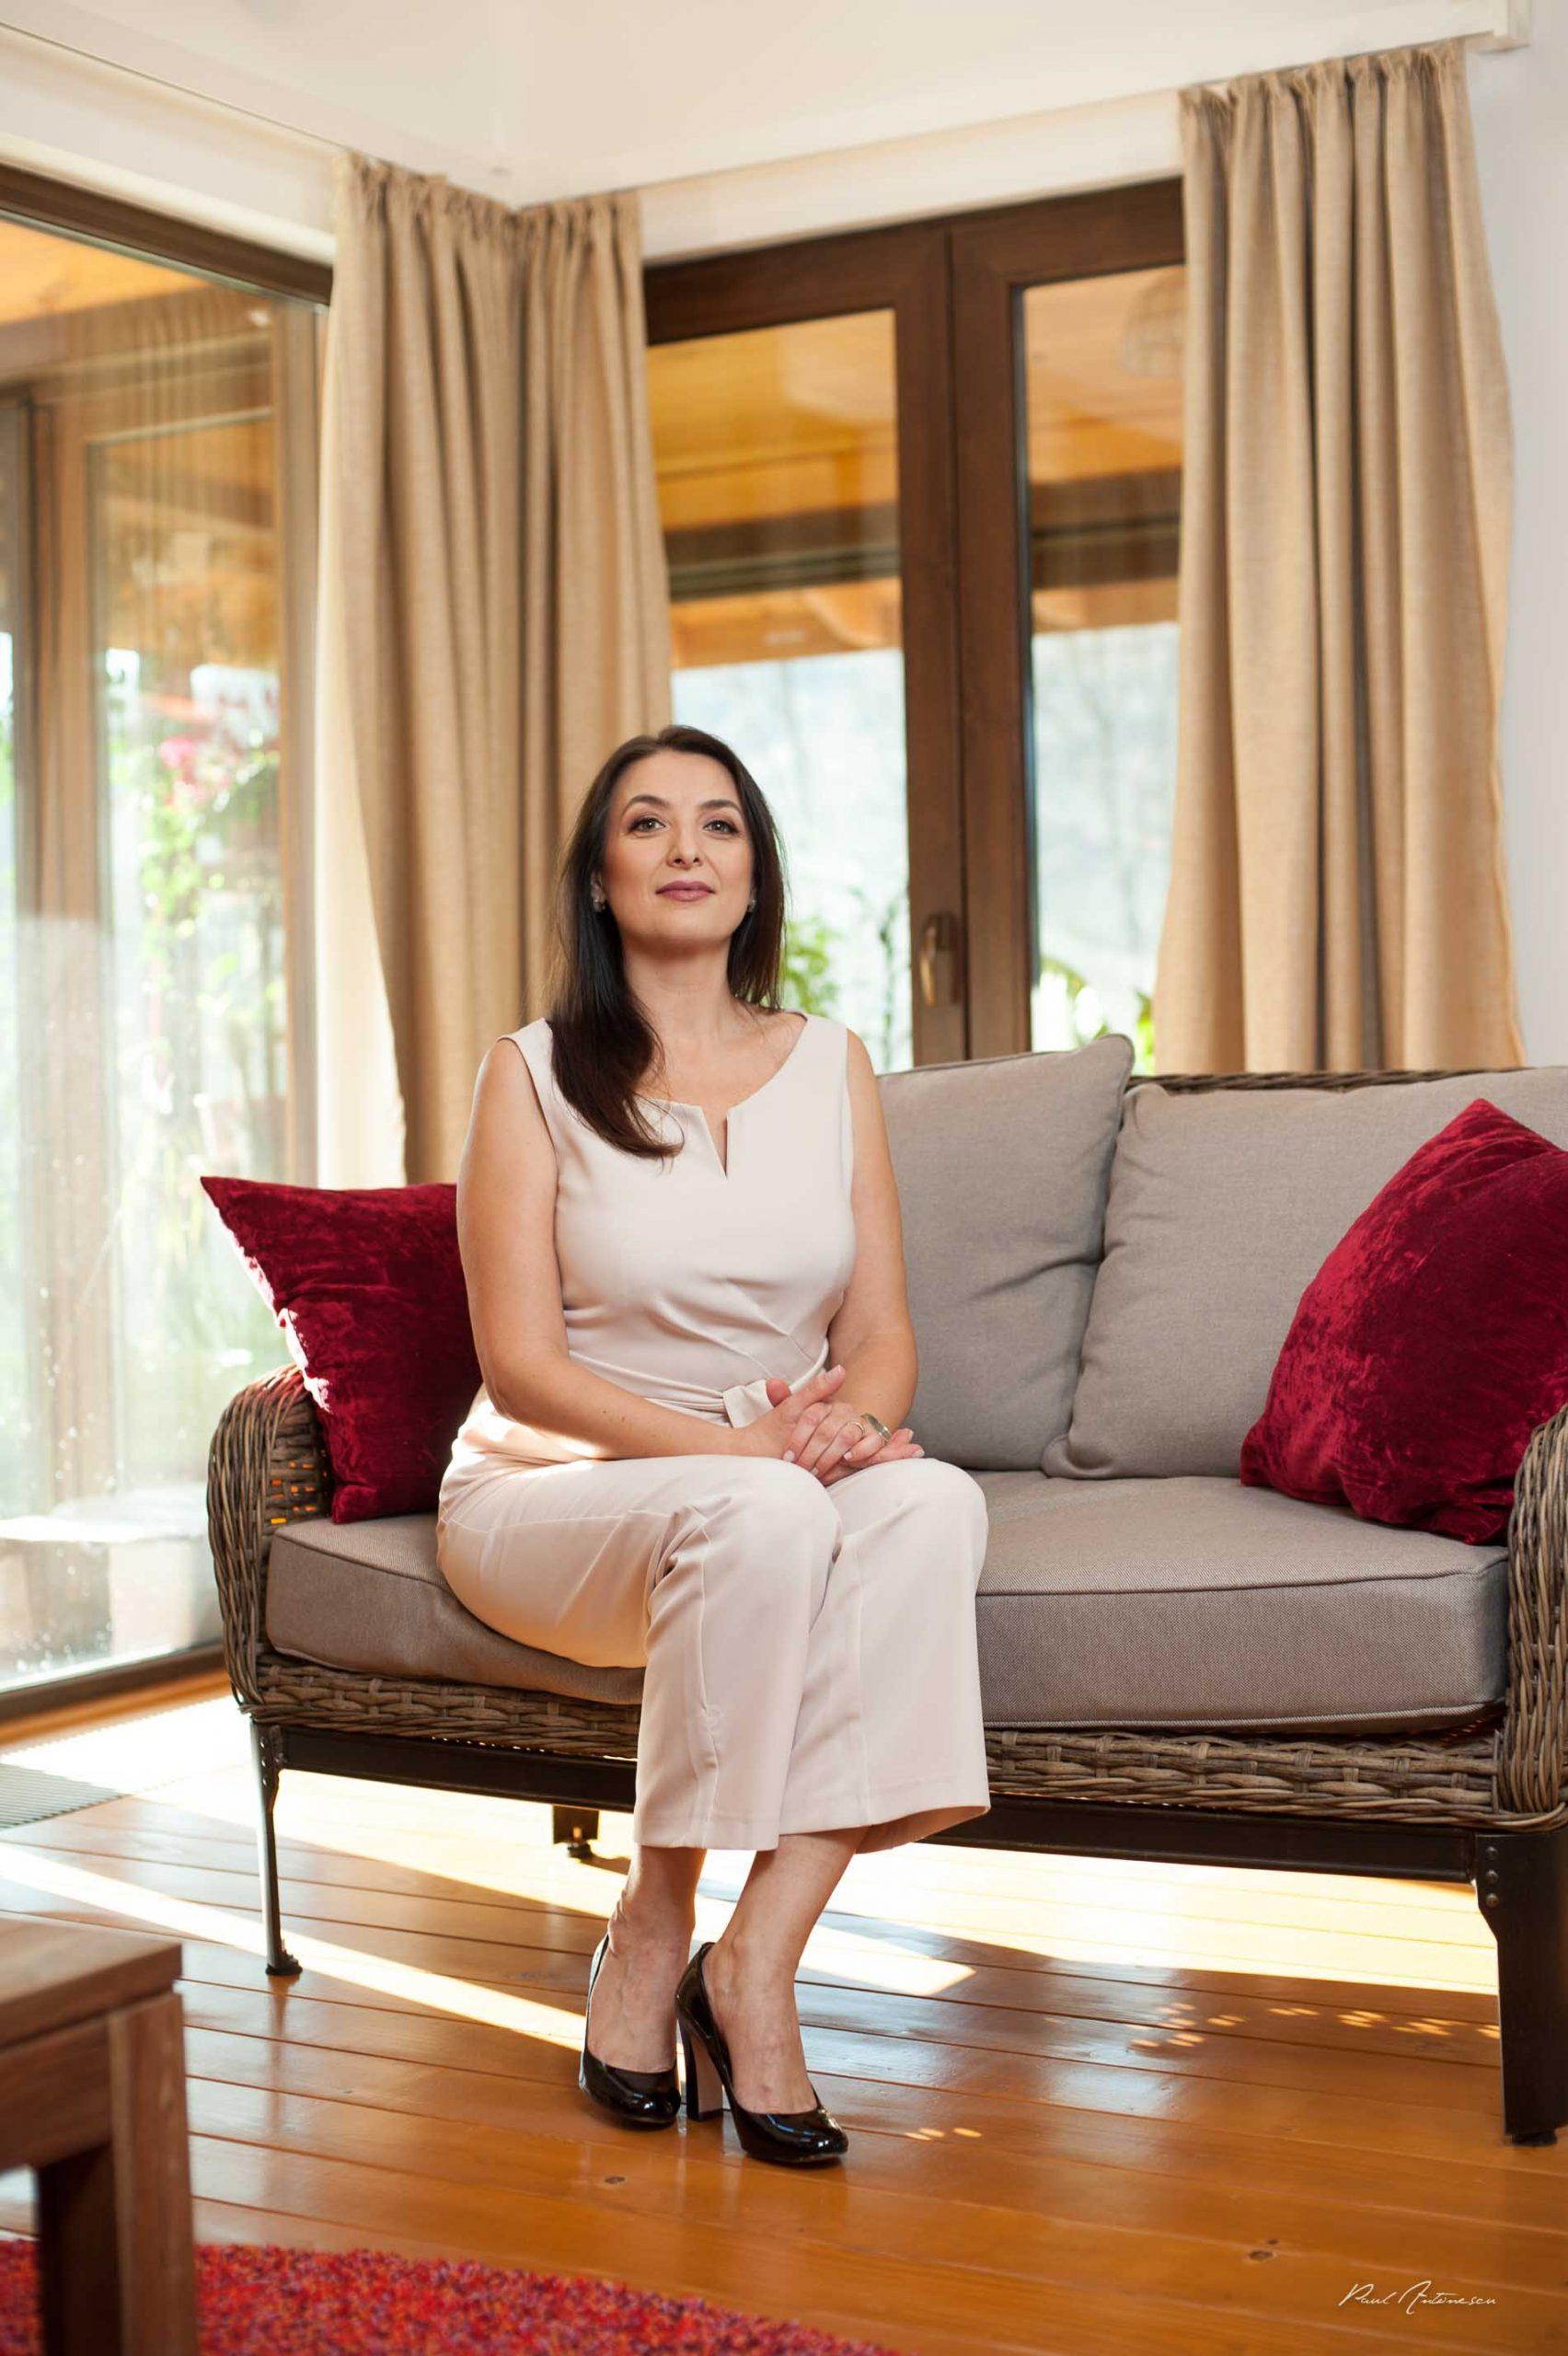 Doamna fotografiata minimalist, razand, cu par lung, negru, la lumina naturala, pe canapea, in casa.